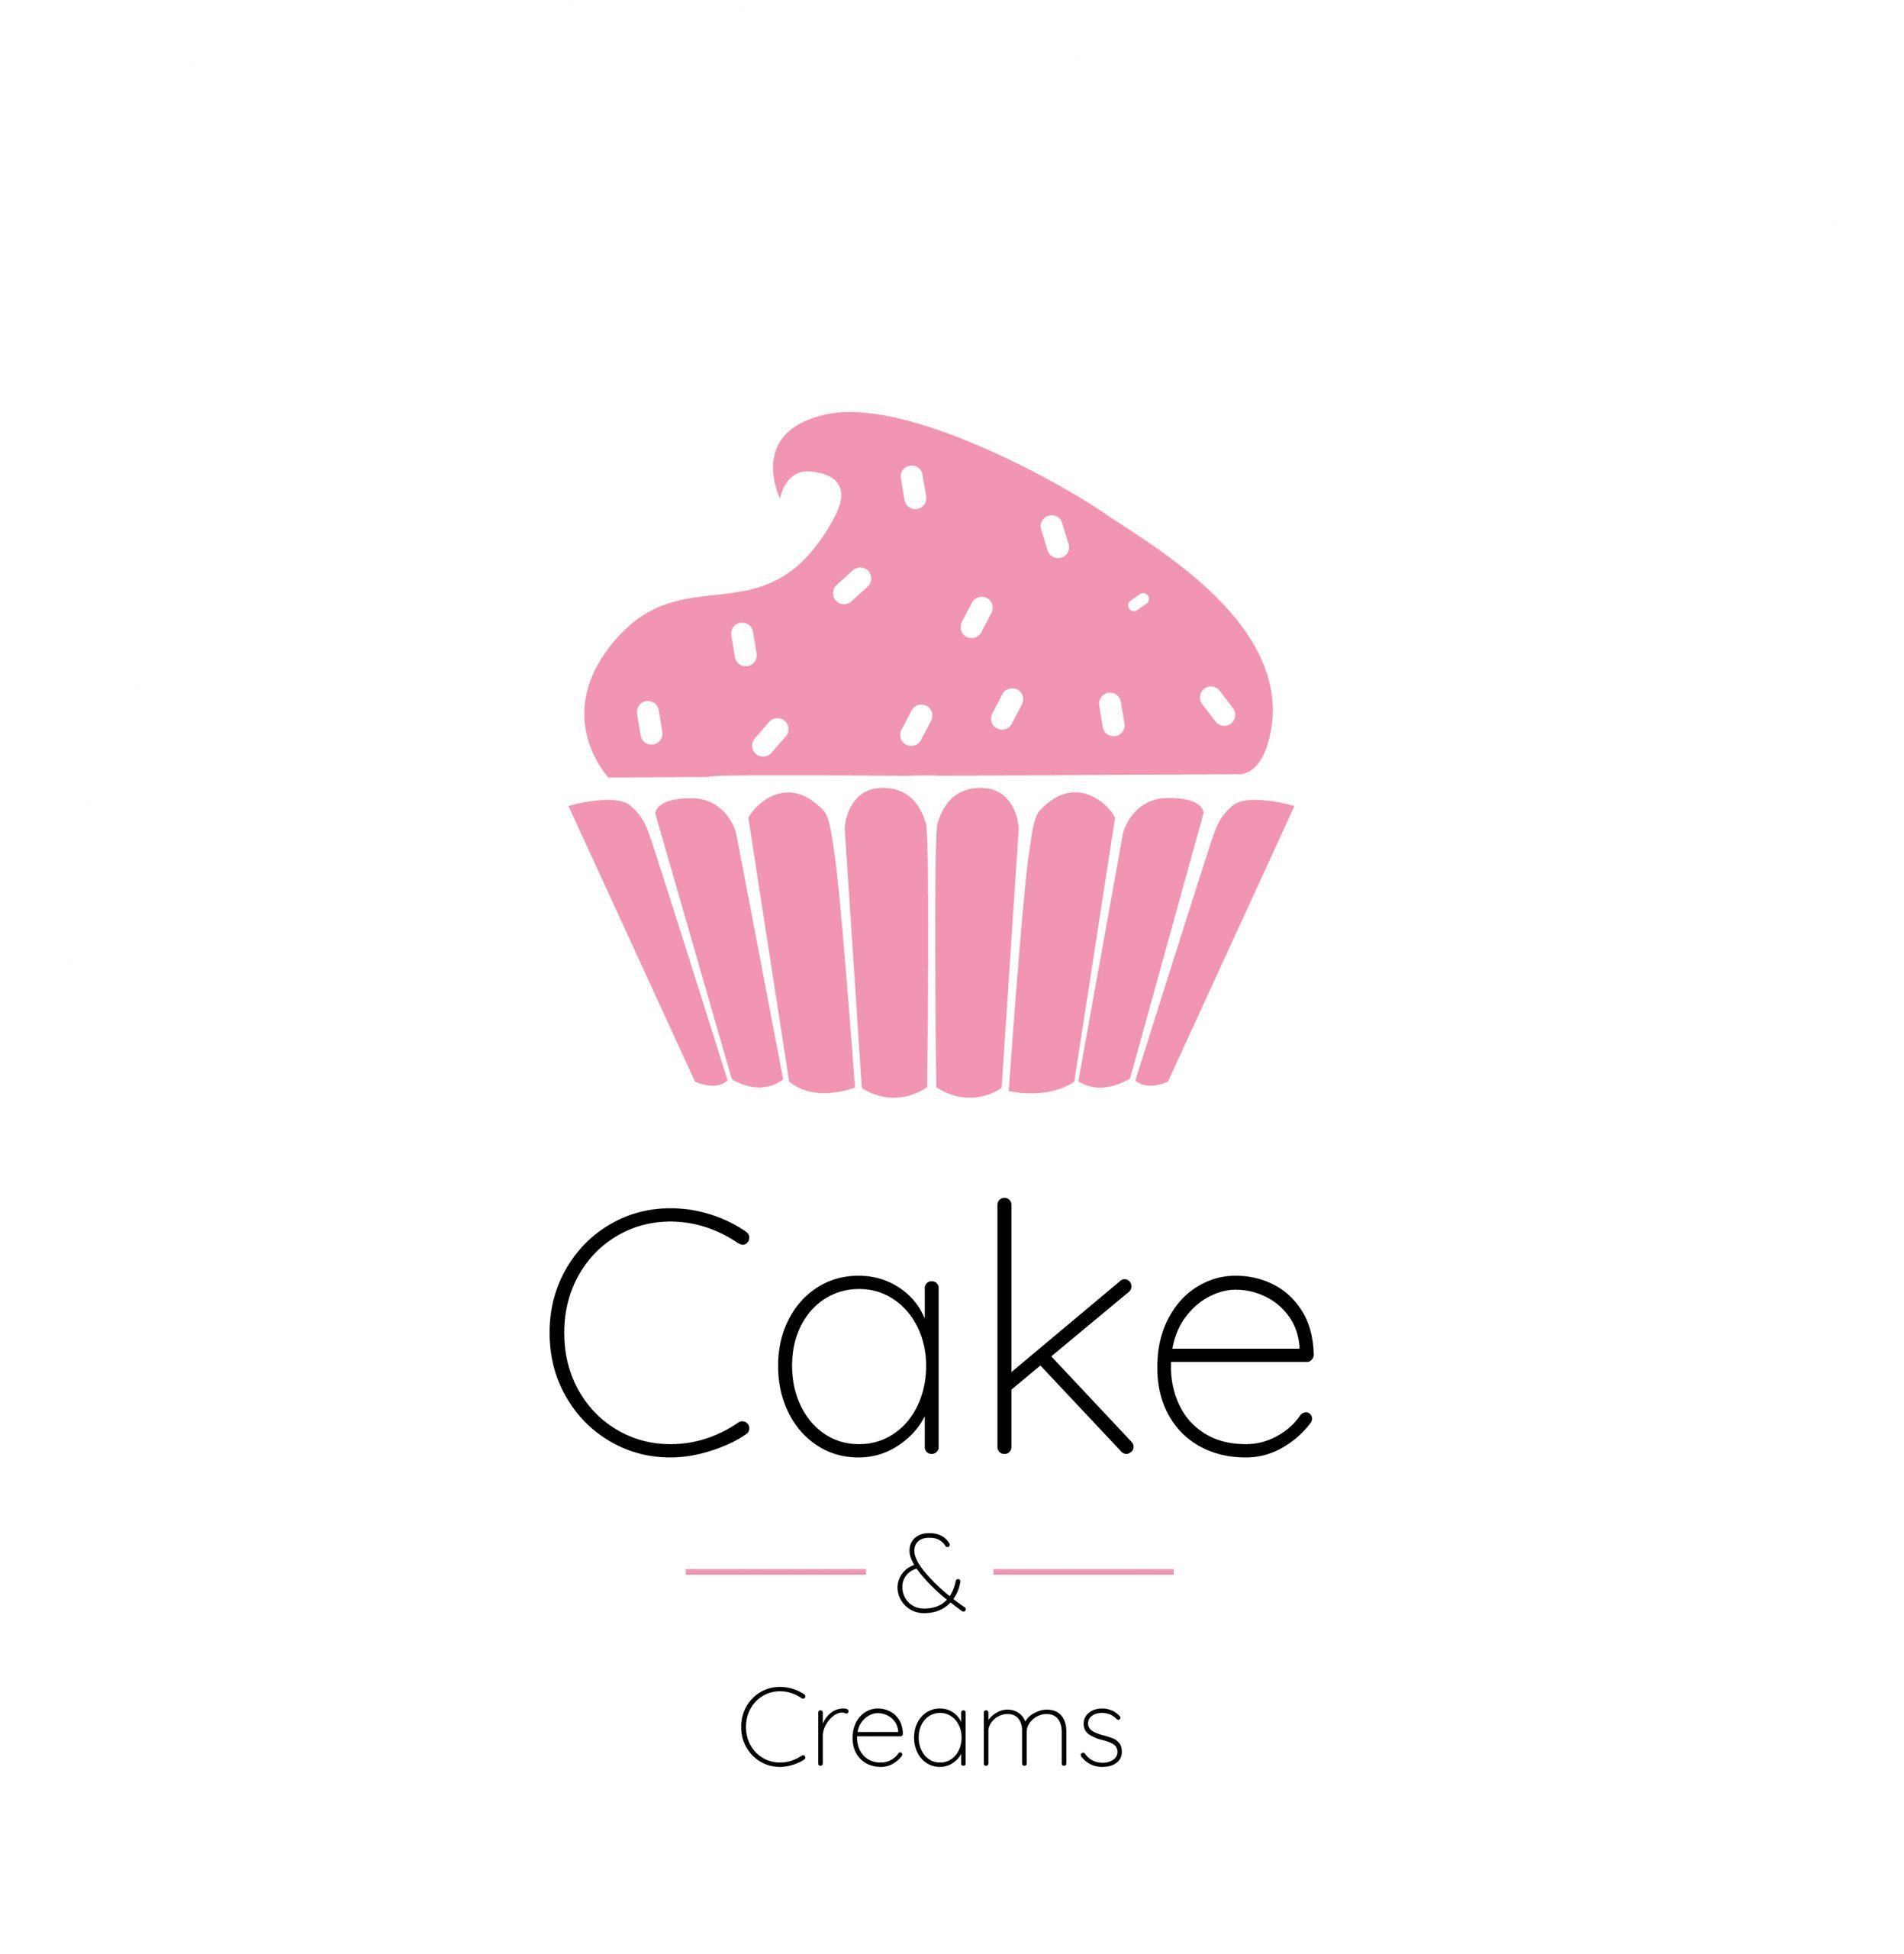 Cake Creams